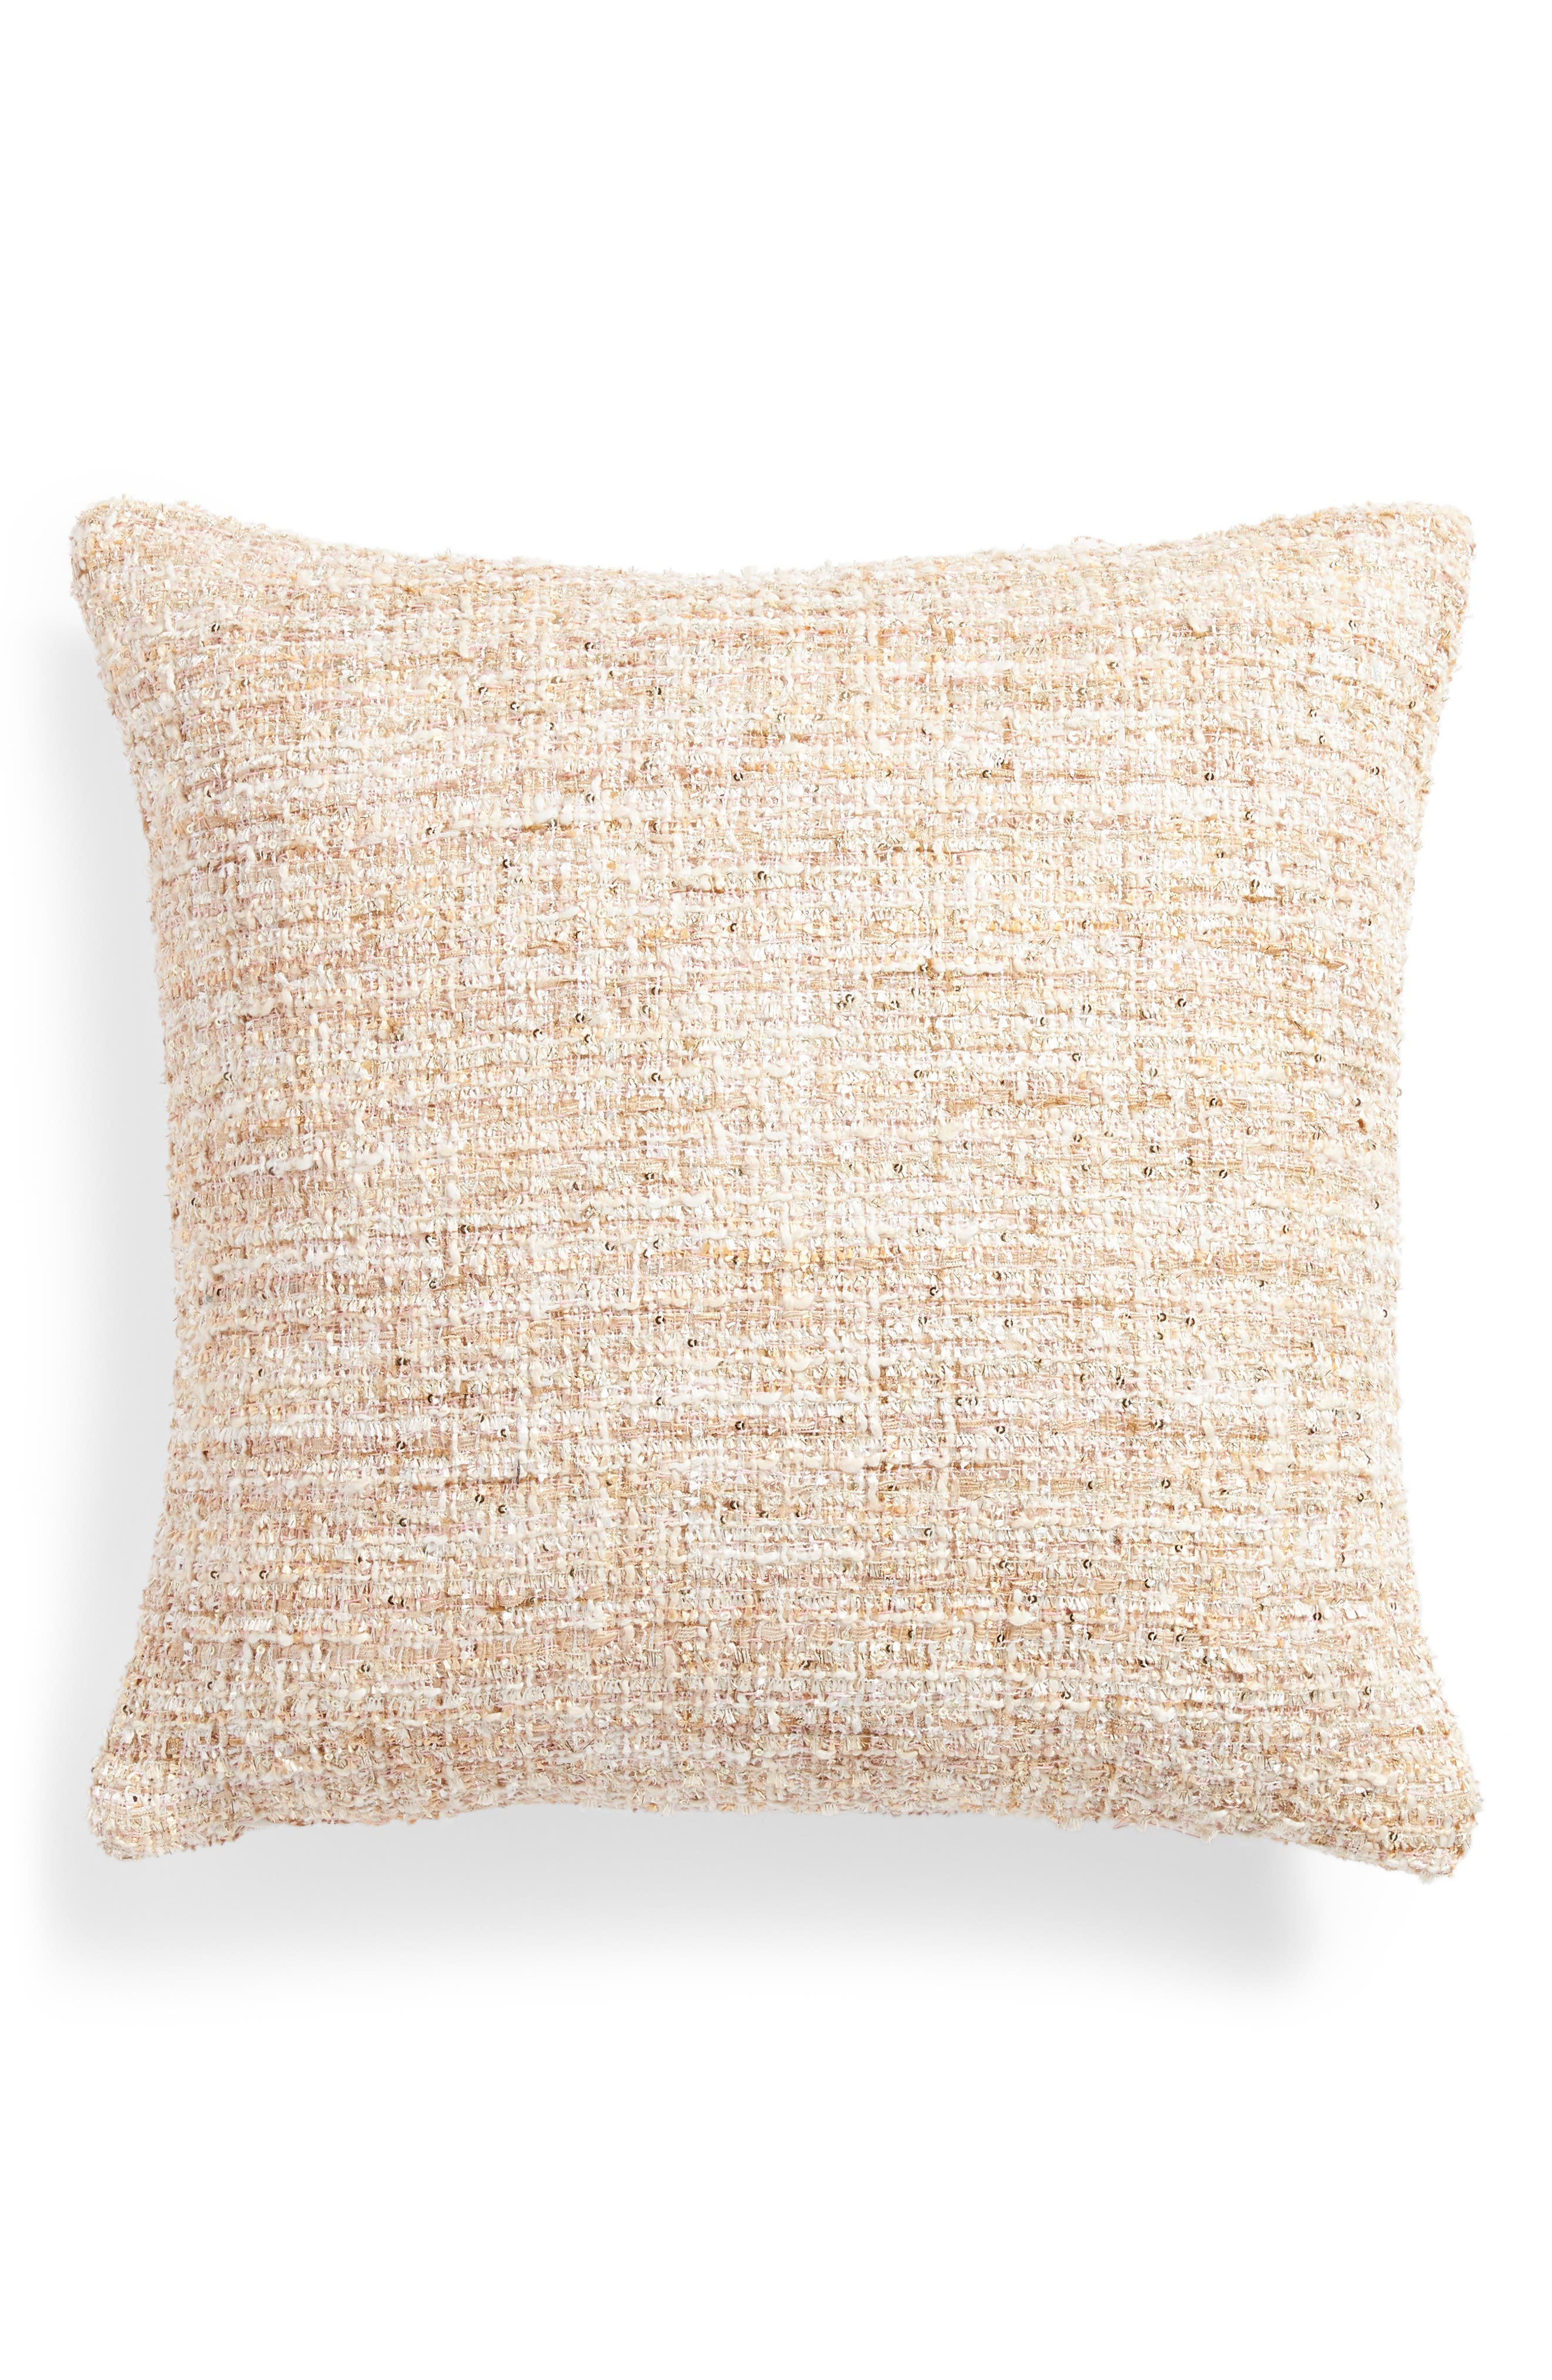 Bride Chilla Accent Pillow,                             Alternate thumbnail 2, color,                             Blush